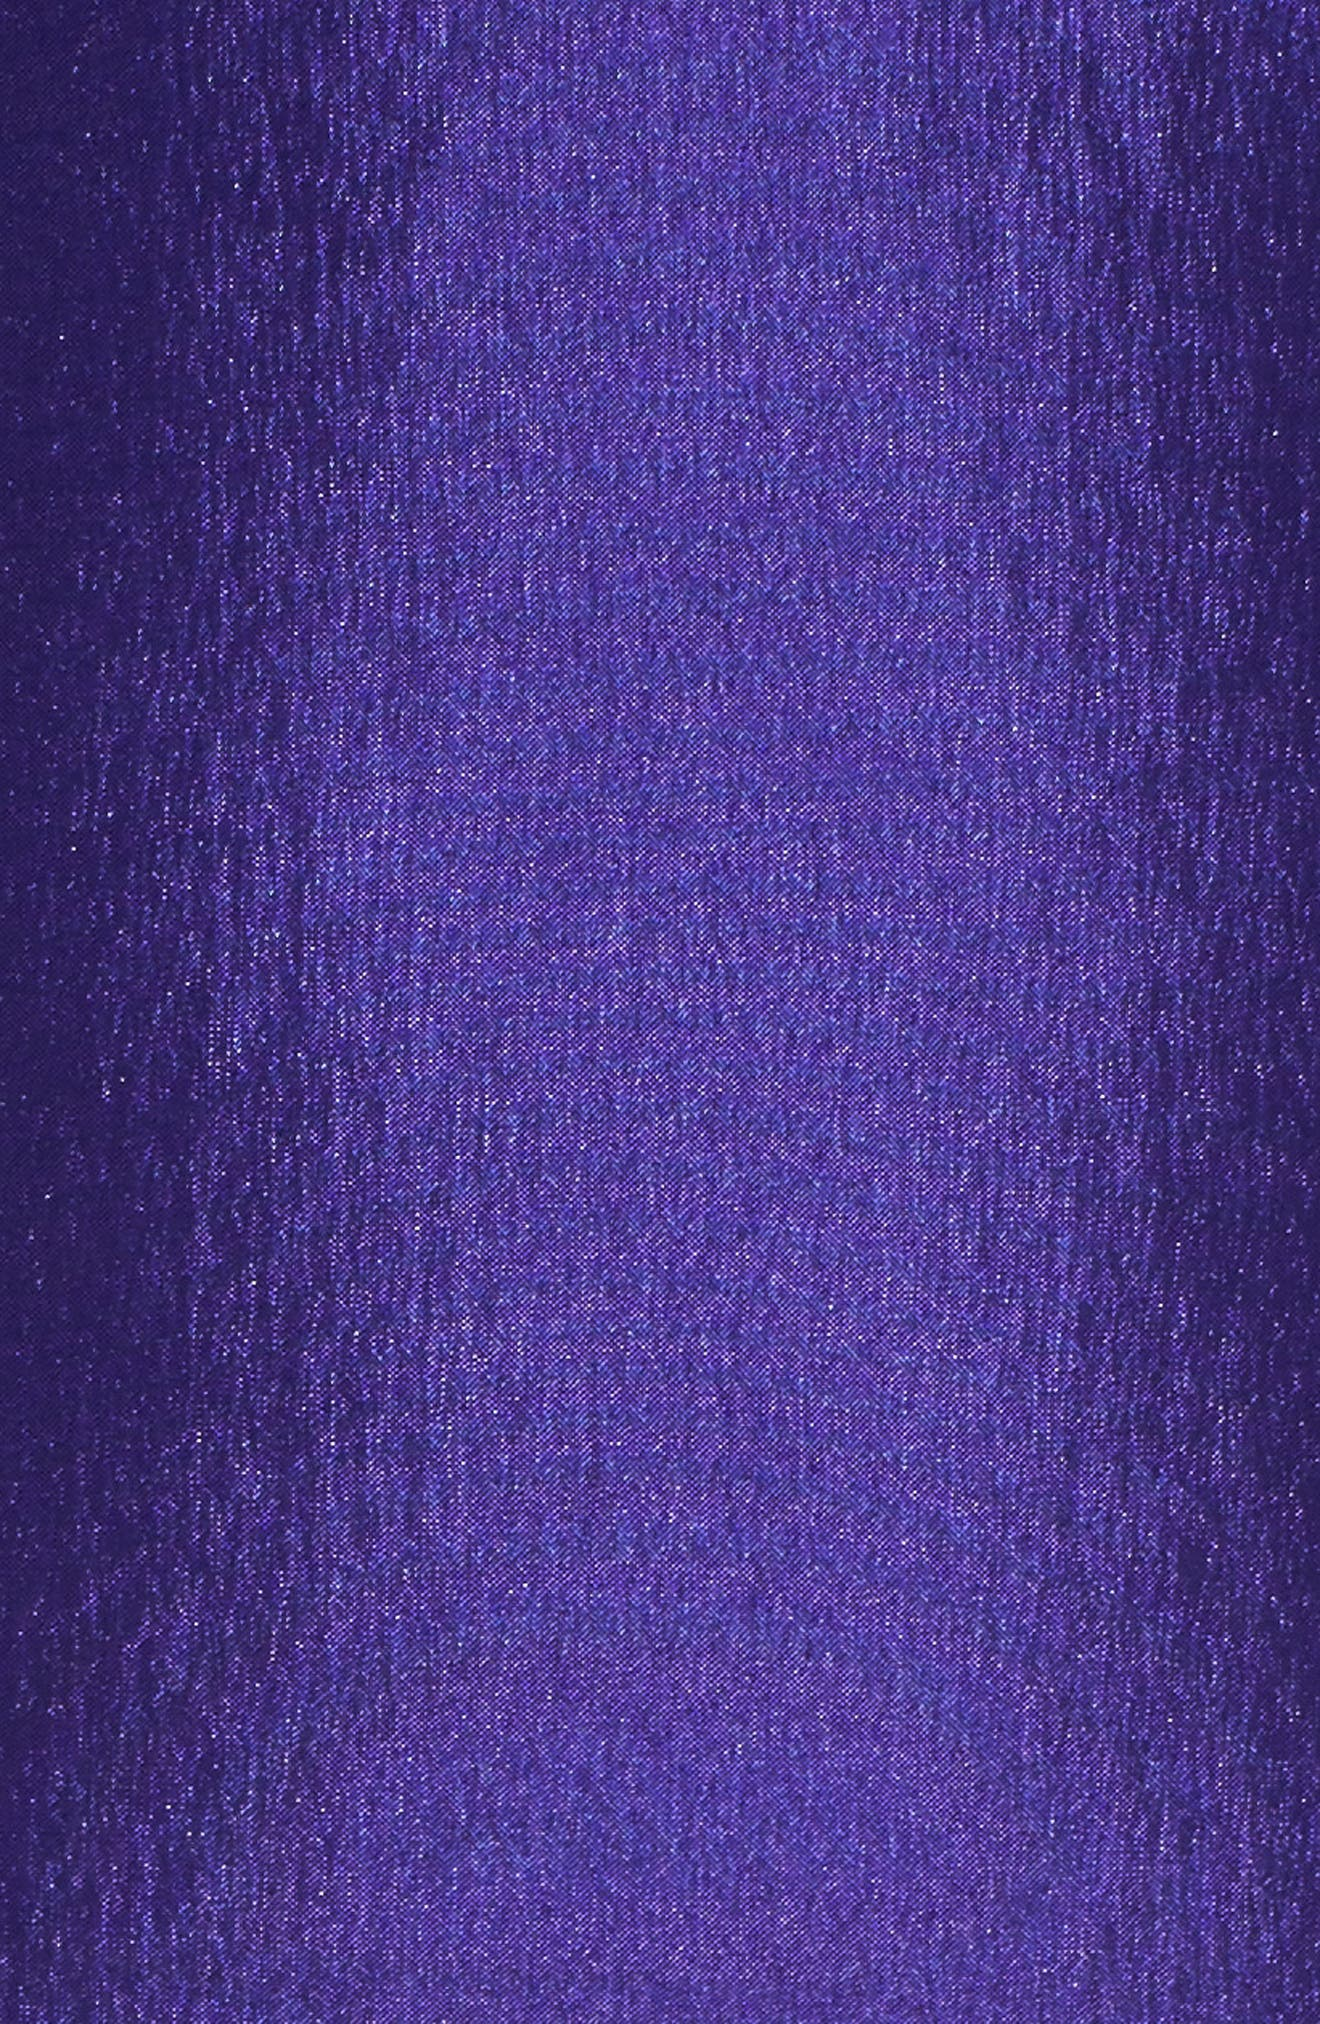 Off the Shoulder Mermaid Gown,                             Alternate thumbnail 5, color,                             ROYAL/ PURPLE